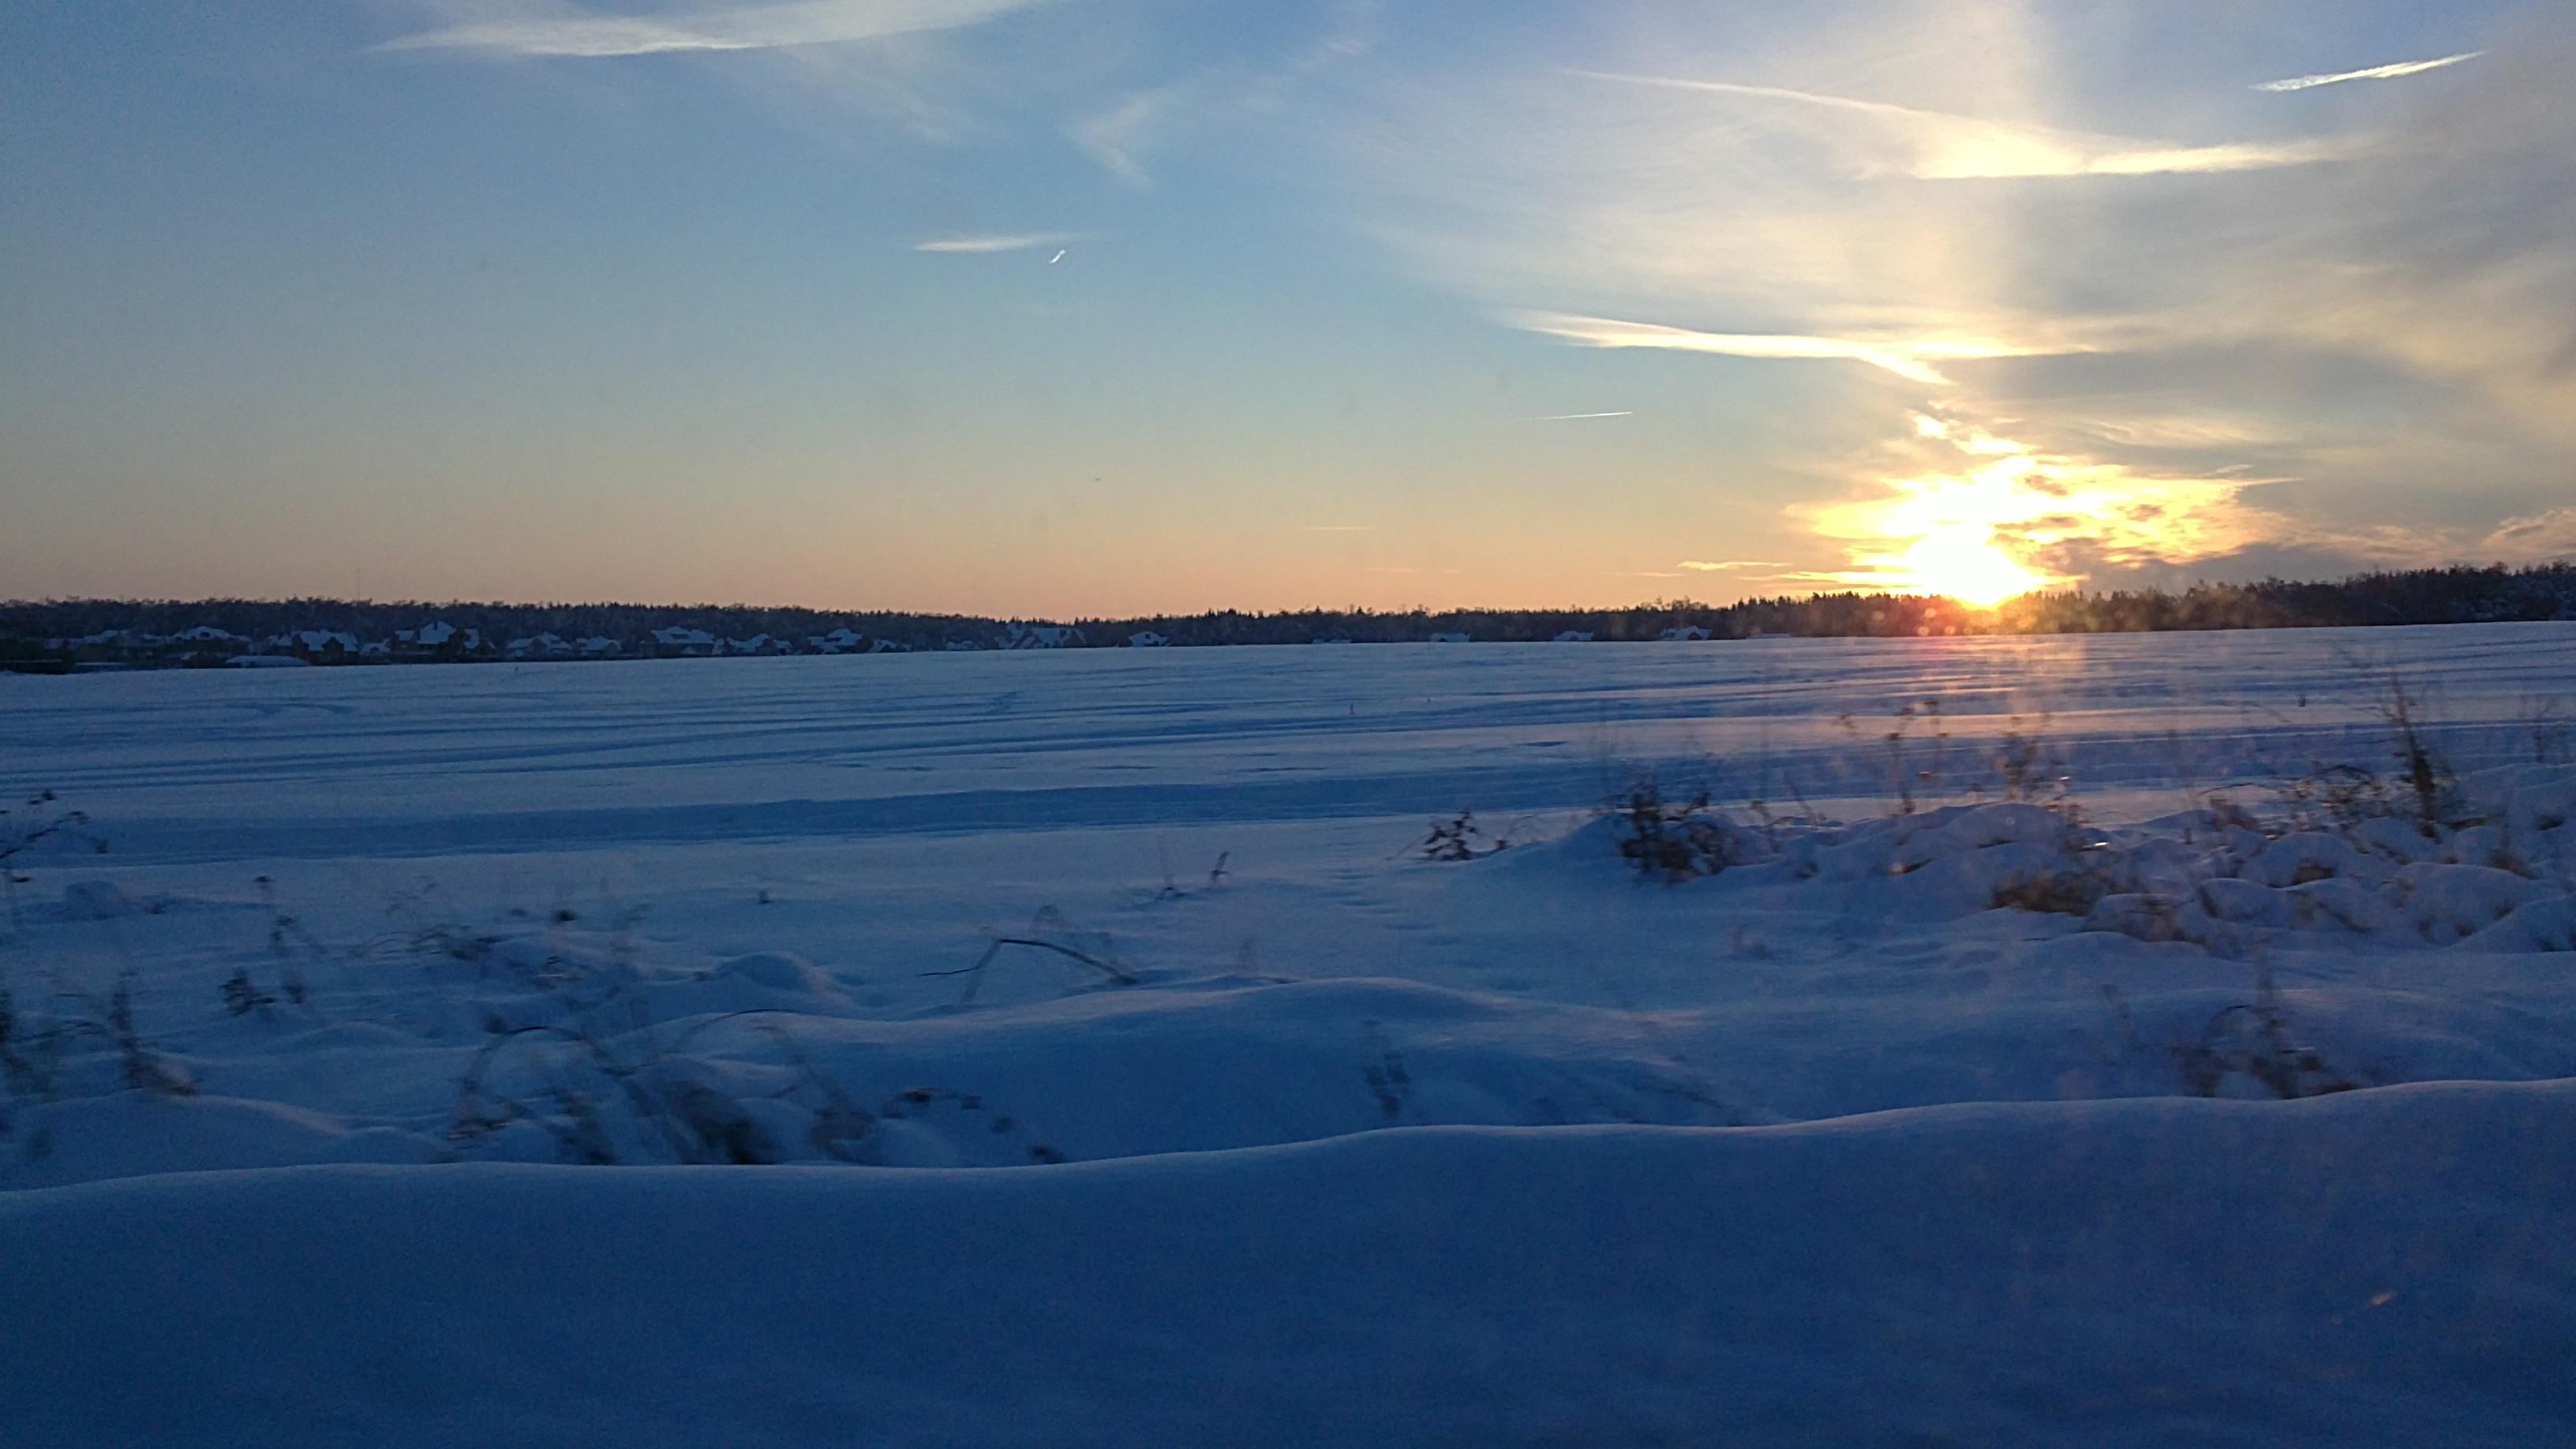 заповедные поляны зимой